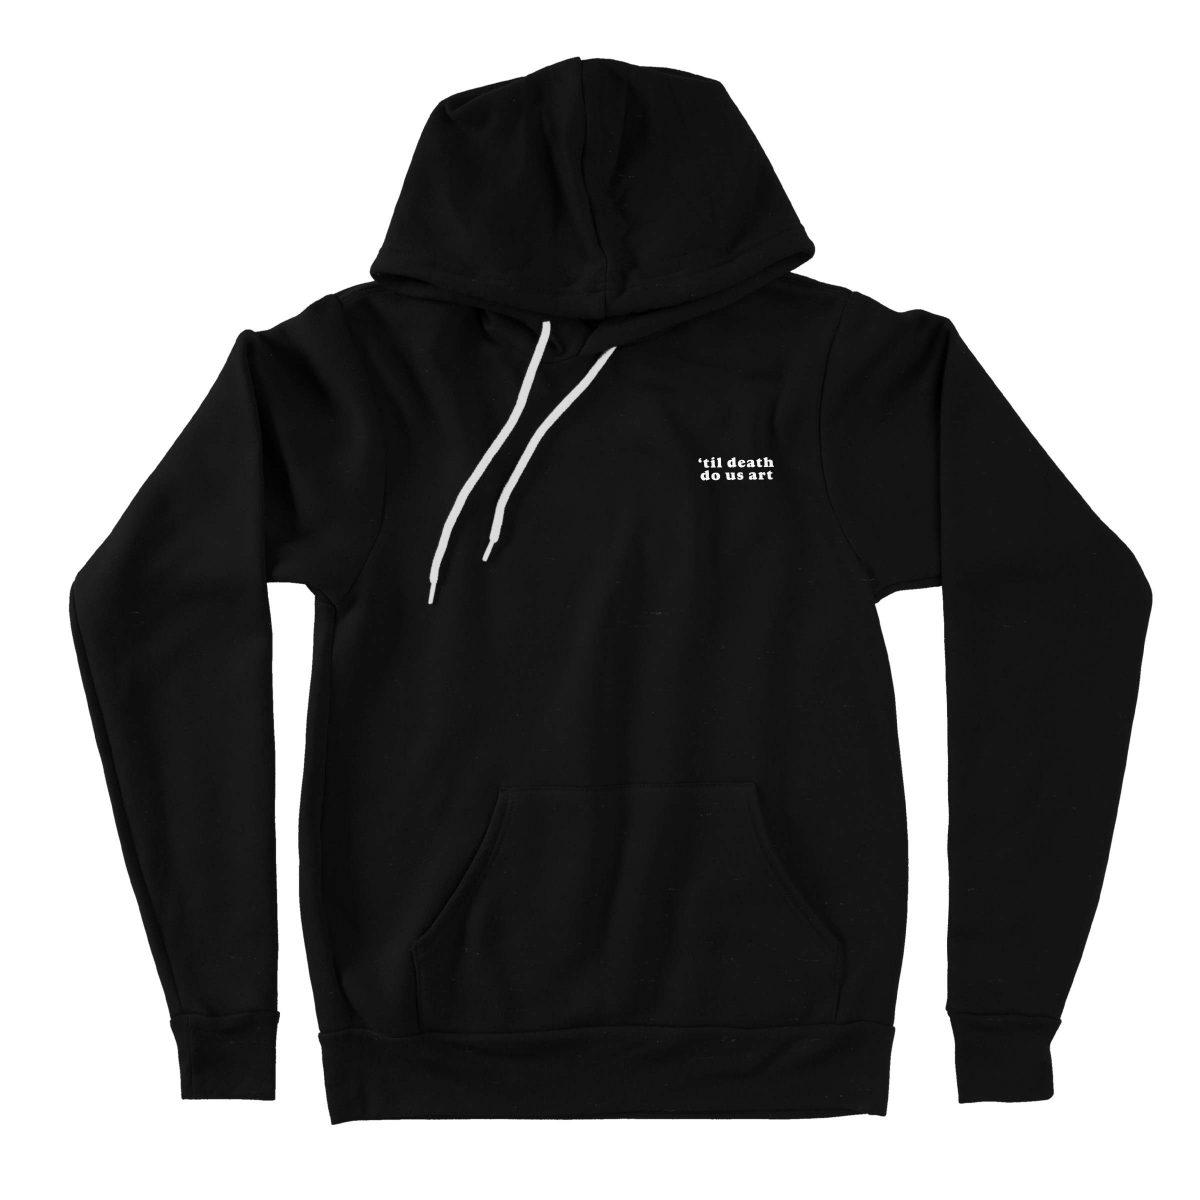 TIL DEATH DO US ART triblend hoodies by kikicutt sweatshirt store